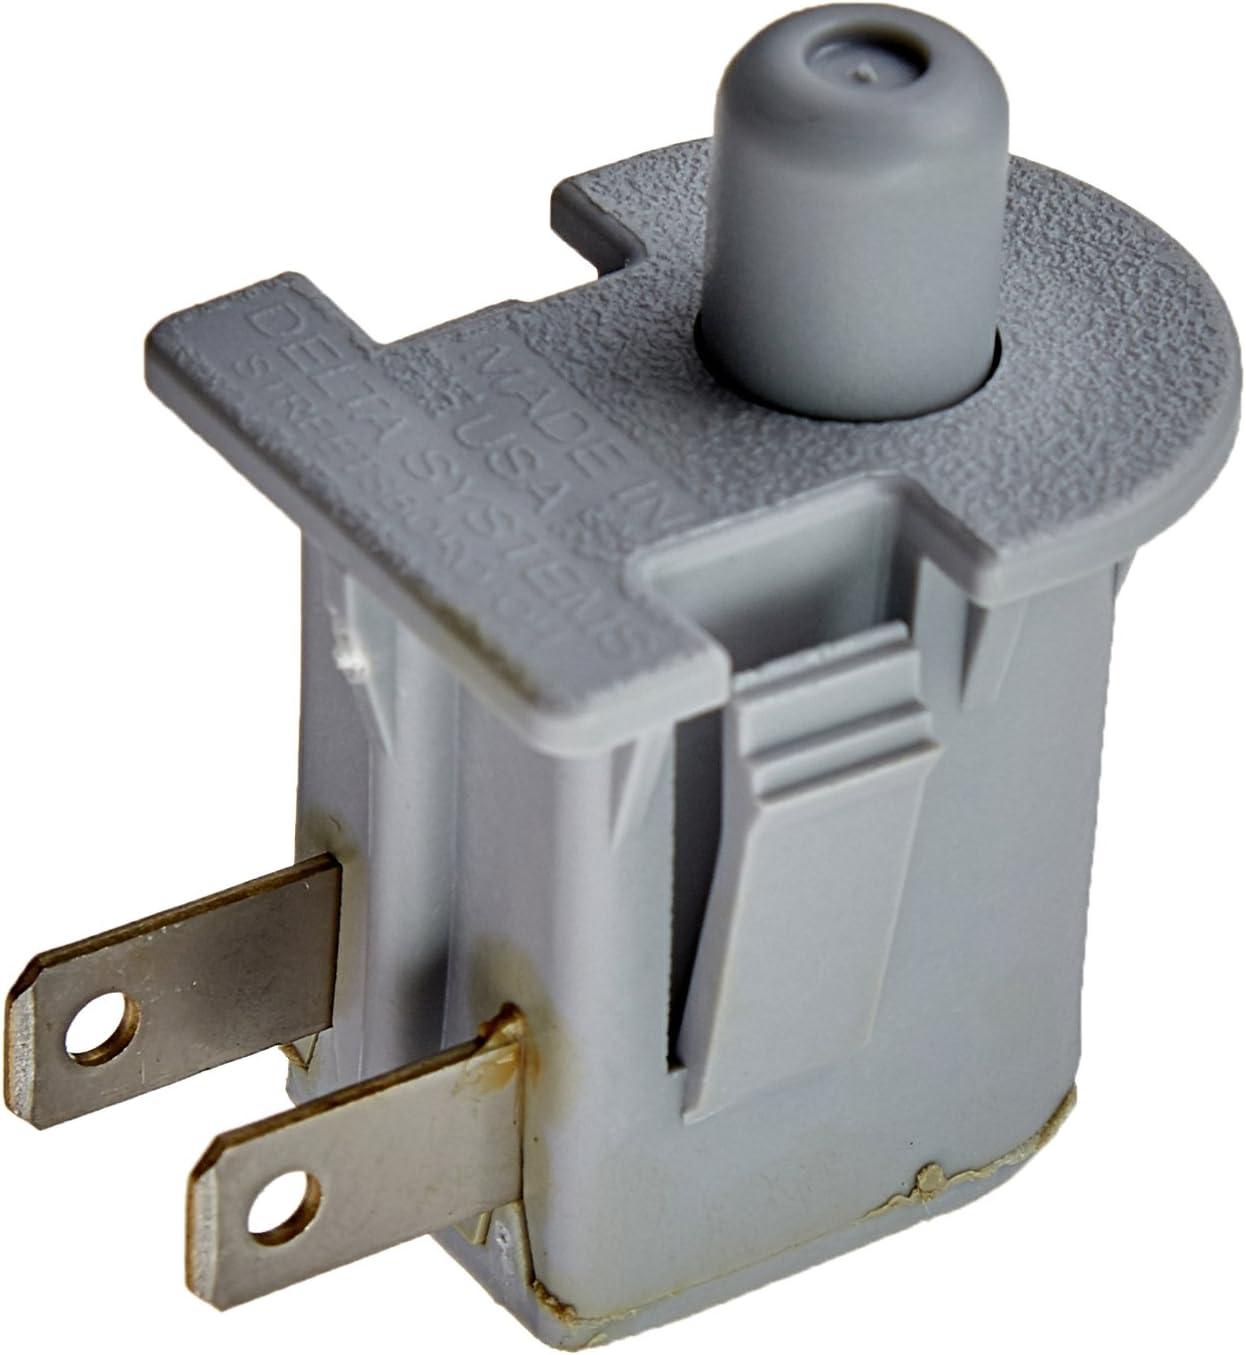 Stens 430-413 Safety Switch Replaces Ariens 02754100 Great Dane AM103119 John Deere AM103119 Kubota K1122-62282 Cub Cadet 925-3167 Simplicity 1704379SM Scag 481638